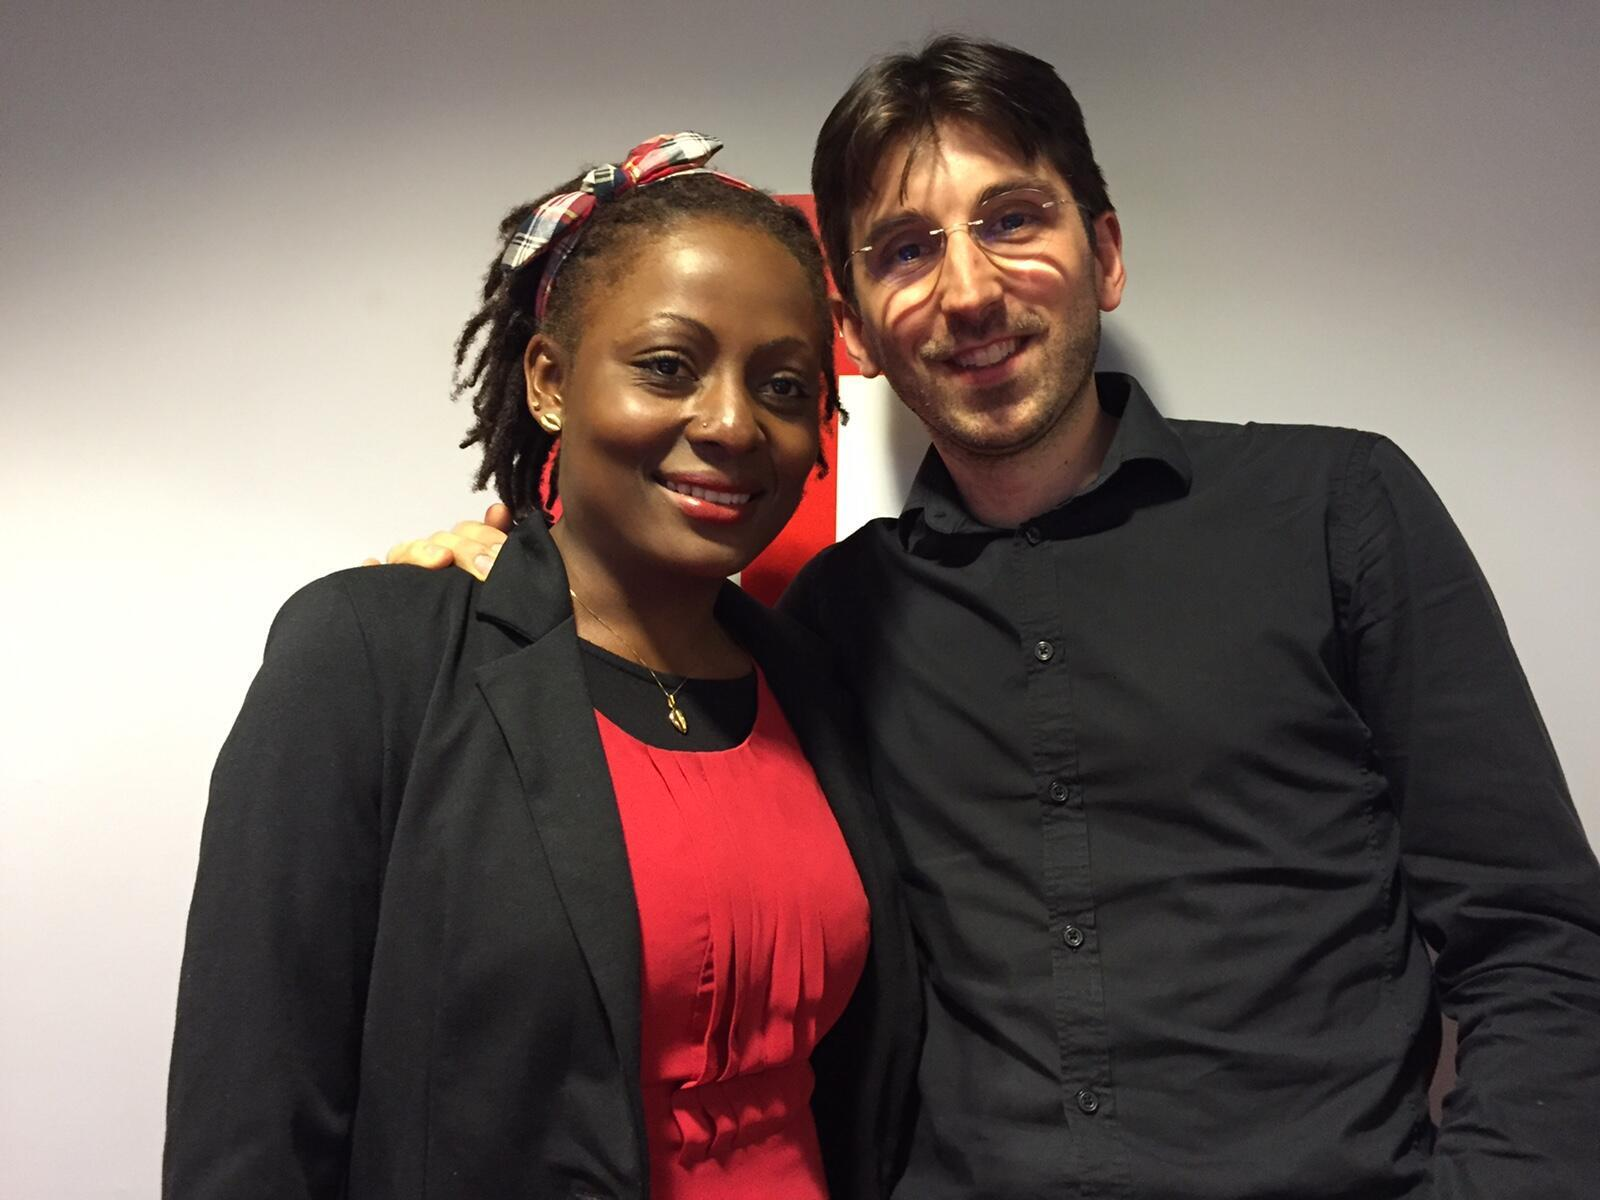 Yolande et Bastien à RFI.